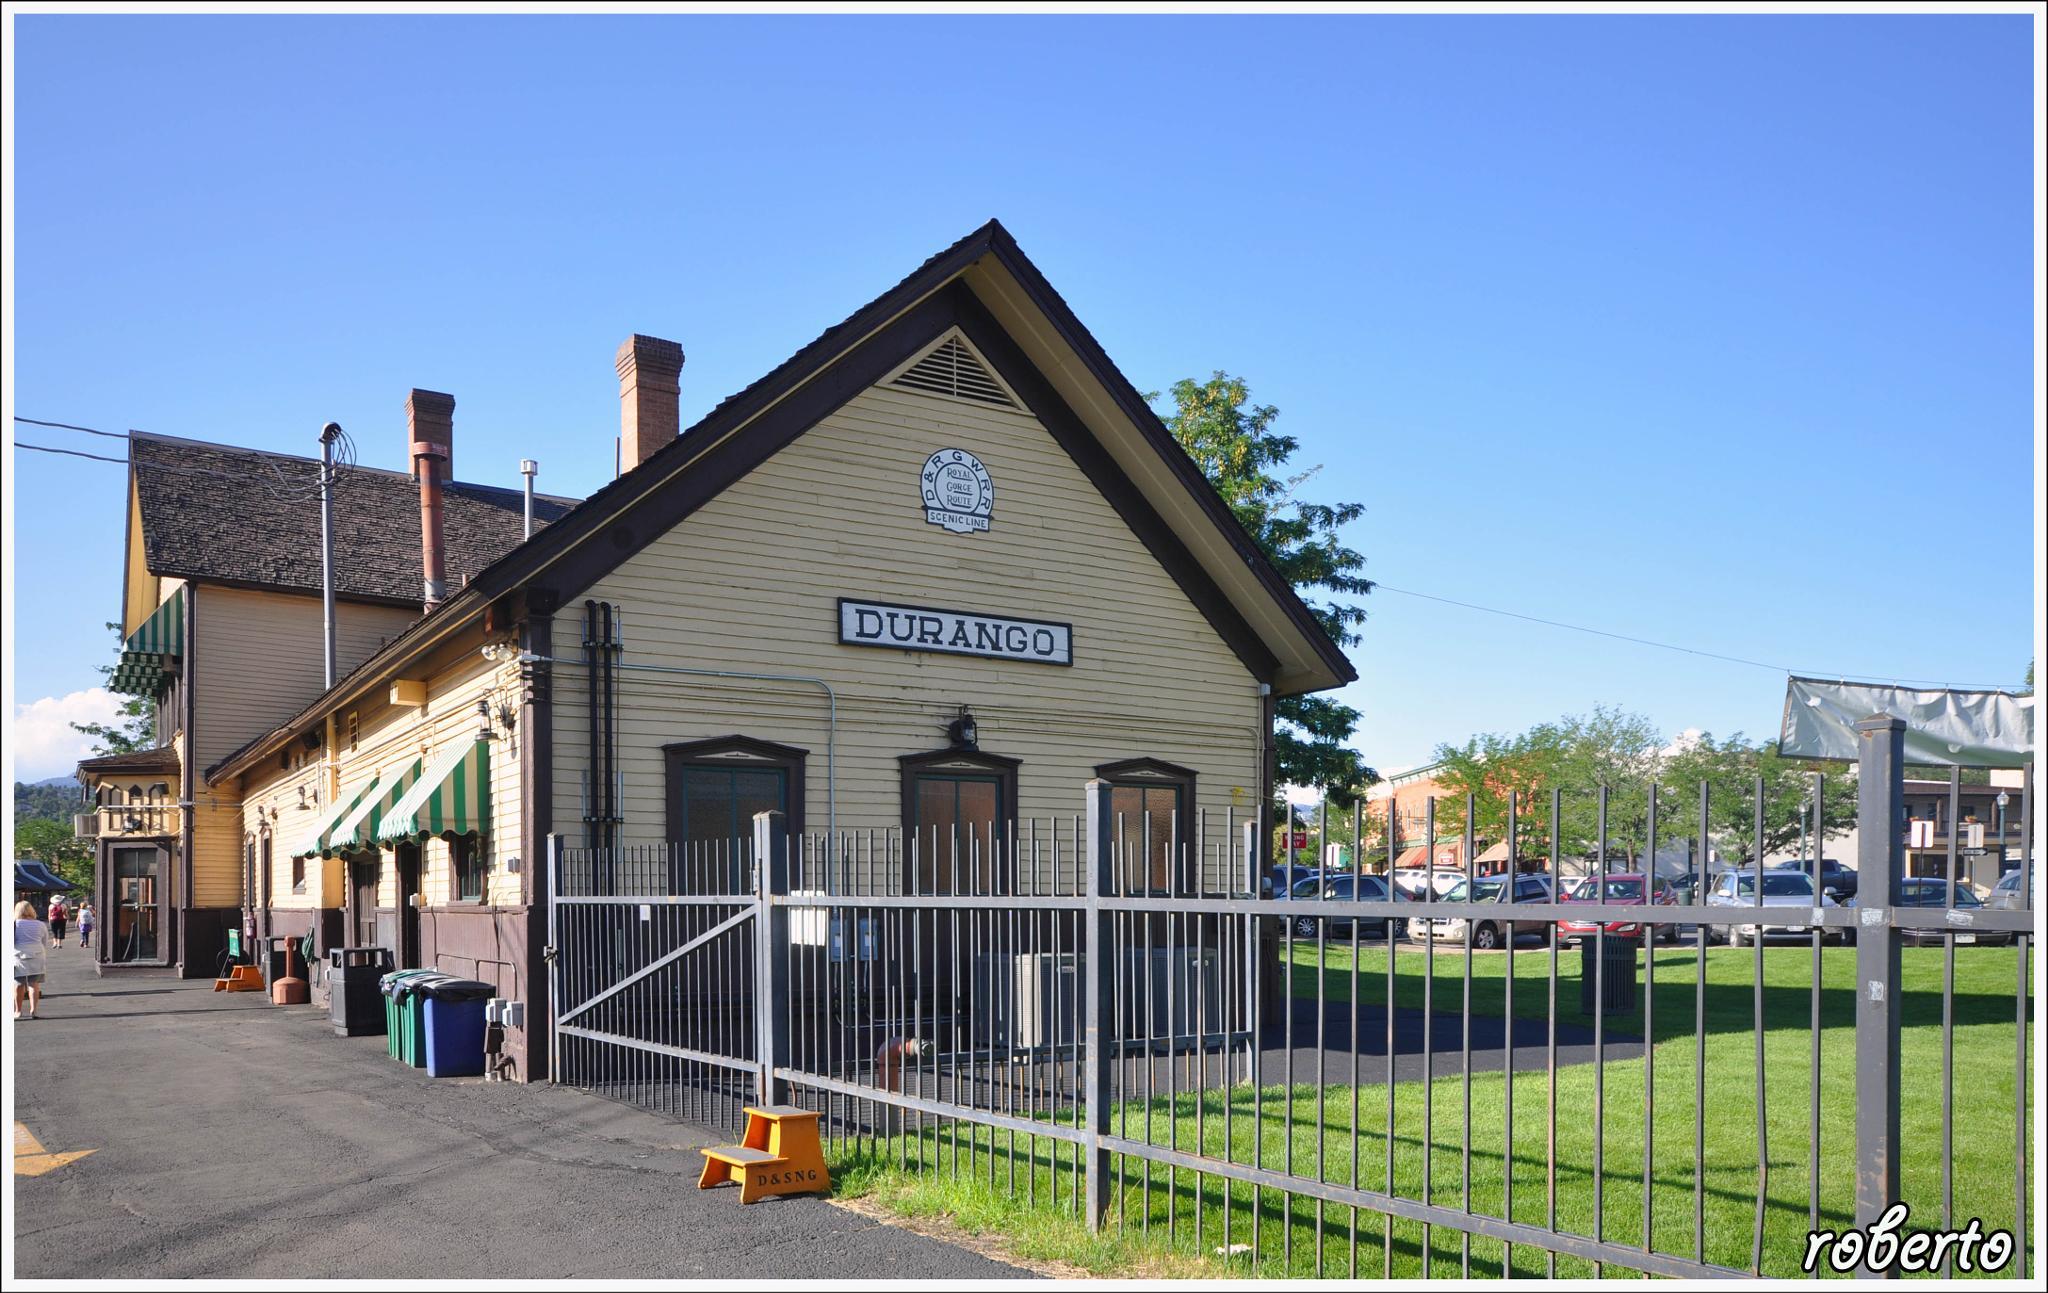 Durango and Silverton Narrow Gauge Railroad & Museum by roberto scarpone